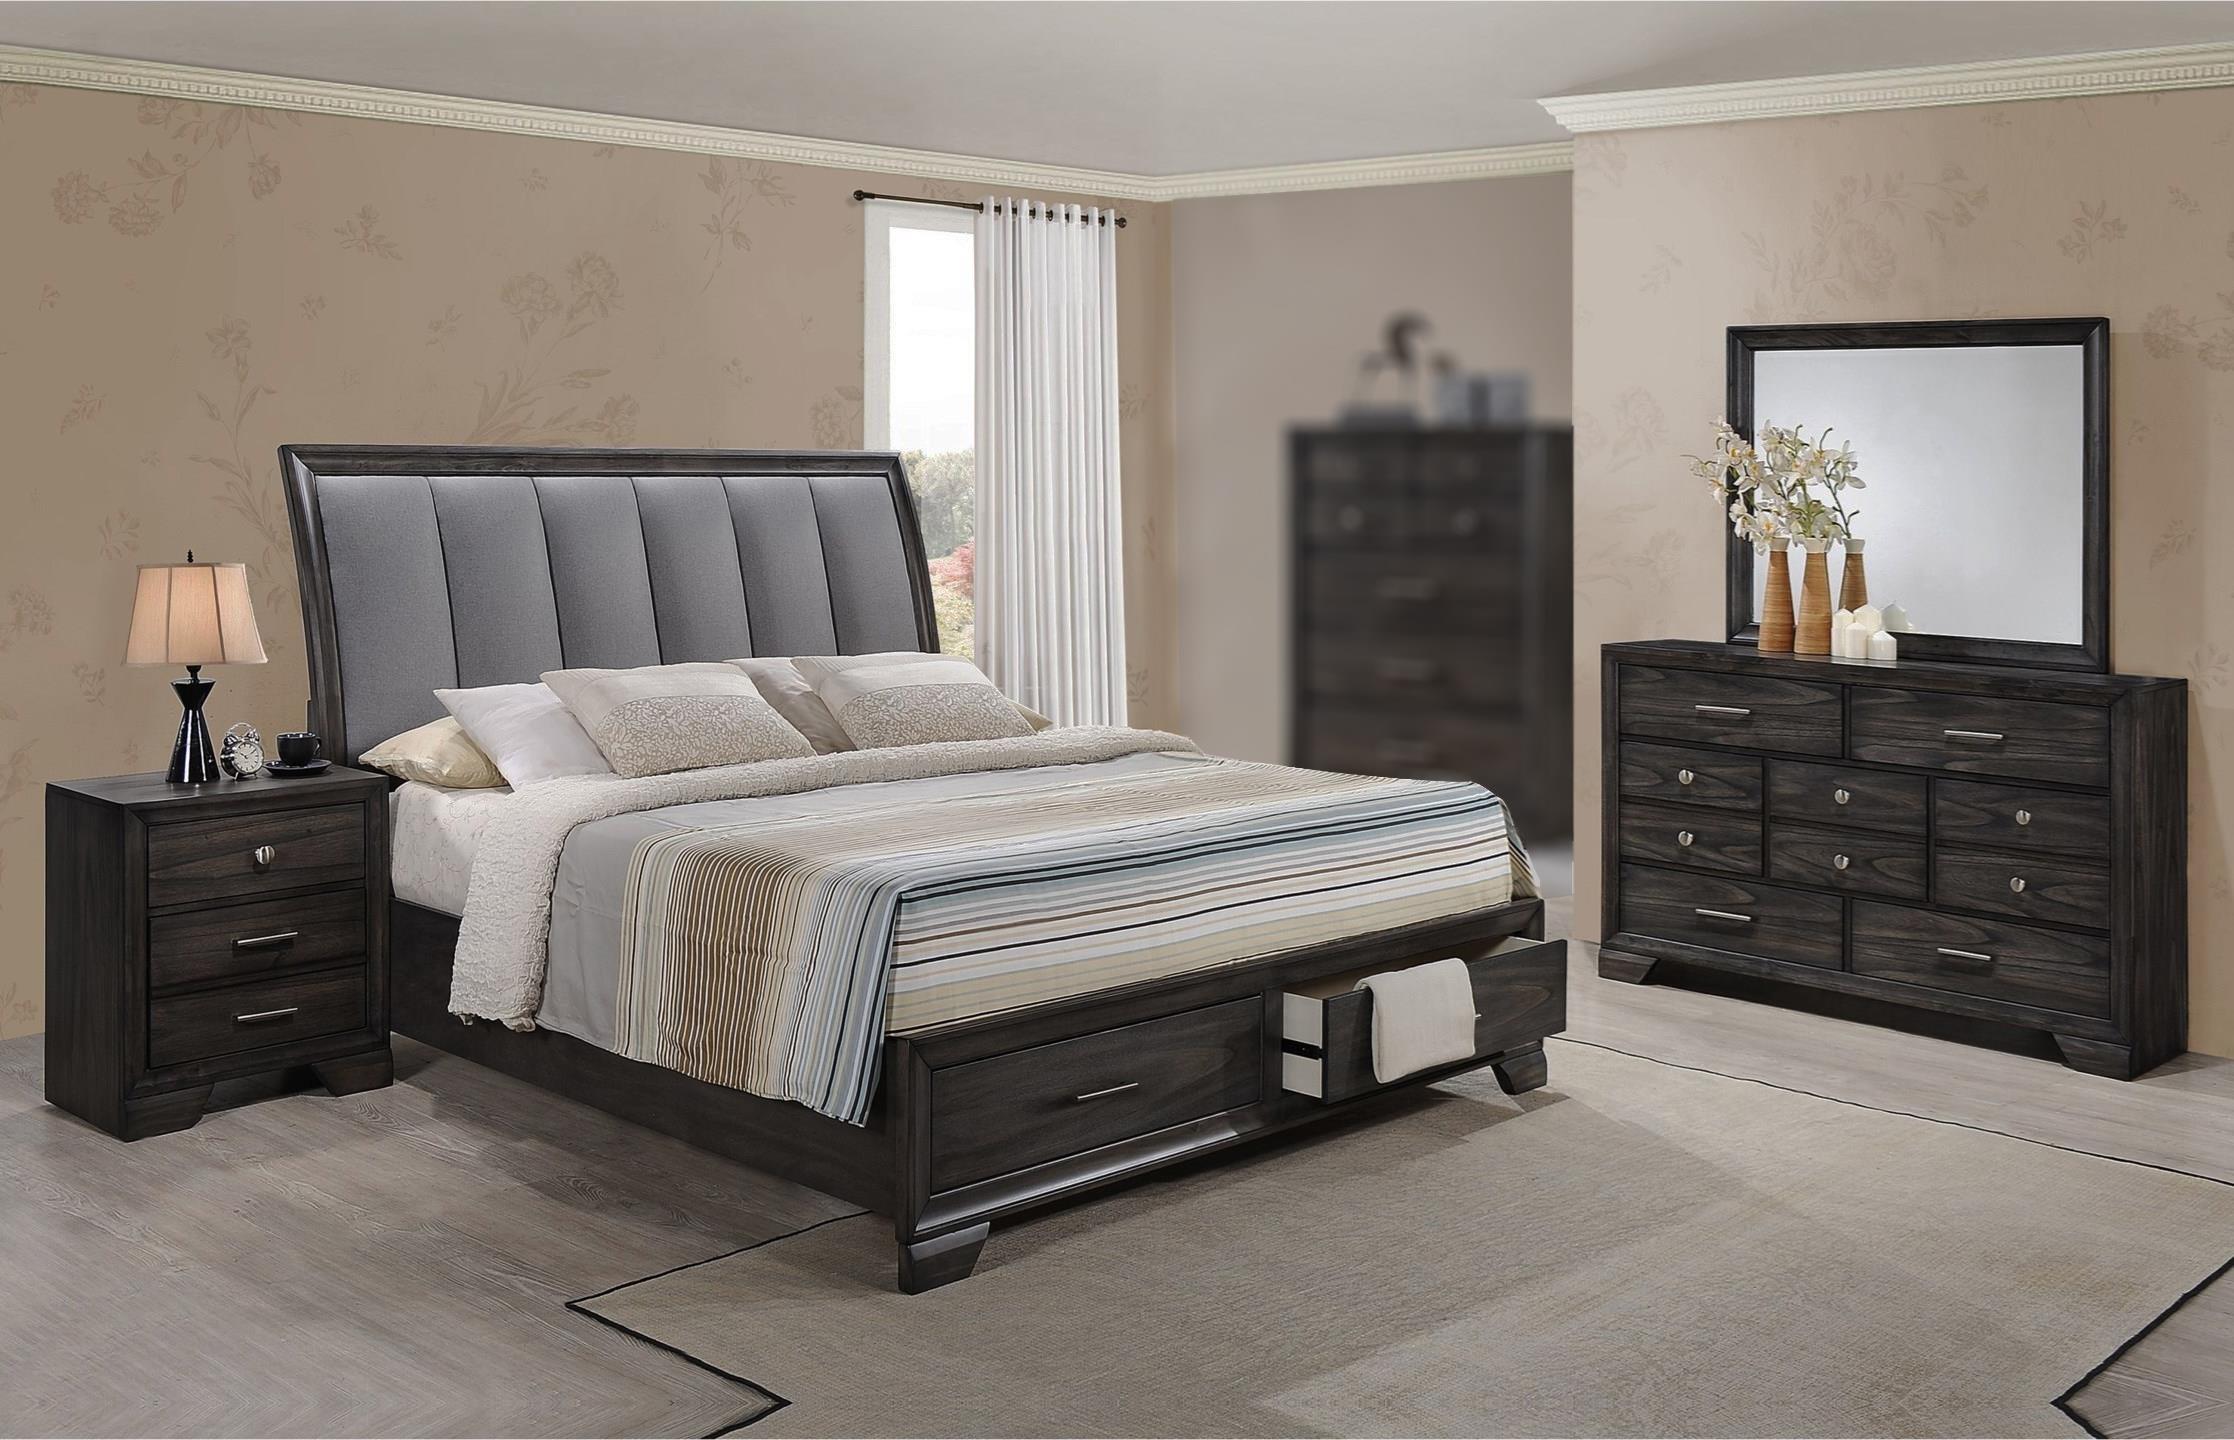 Jameson 4PC King Storage Bedroom Set at Rotmans